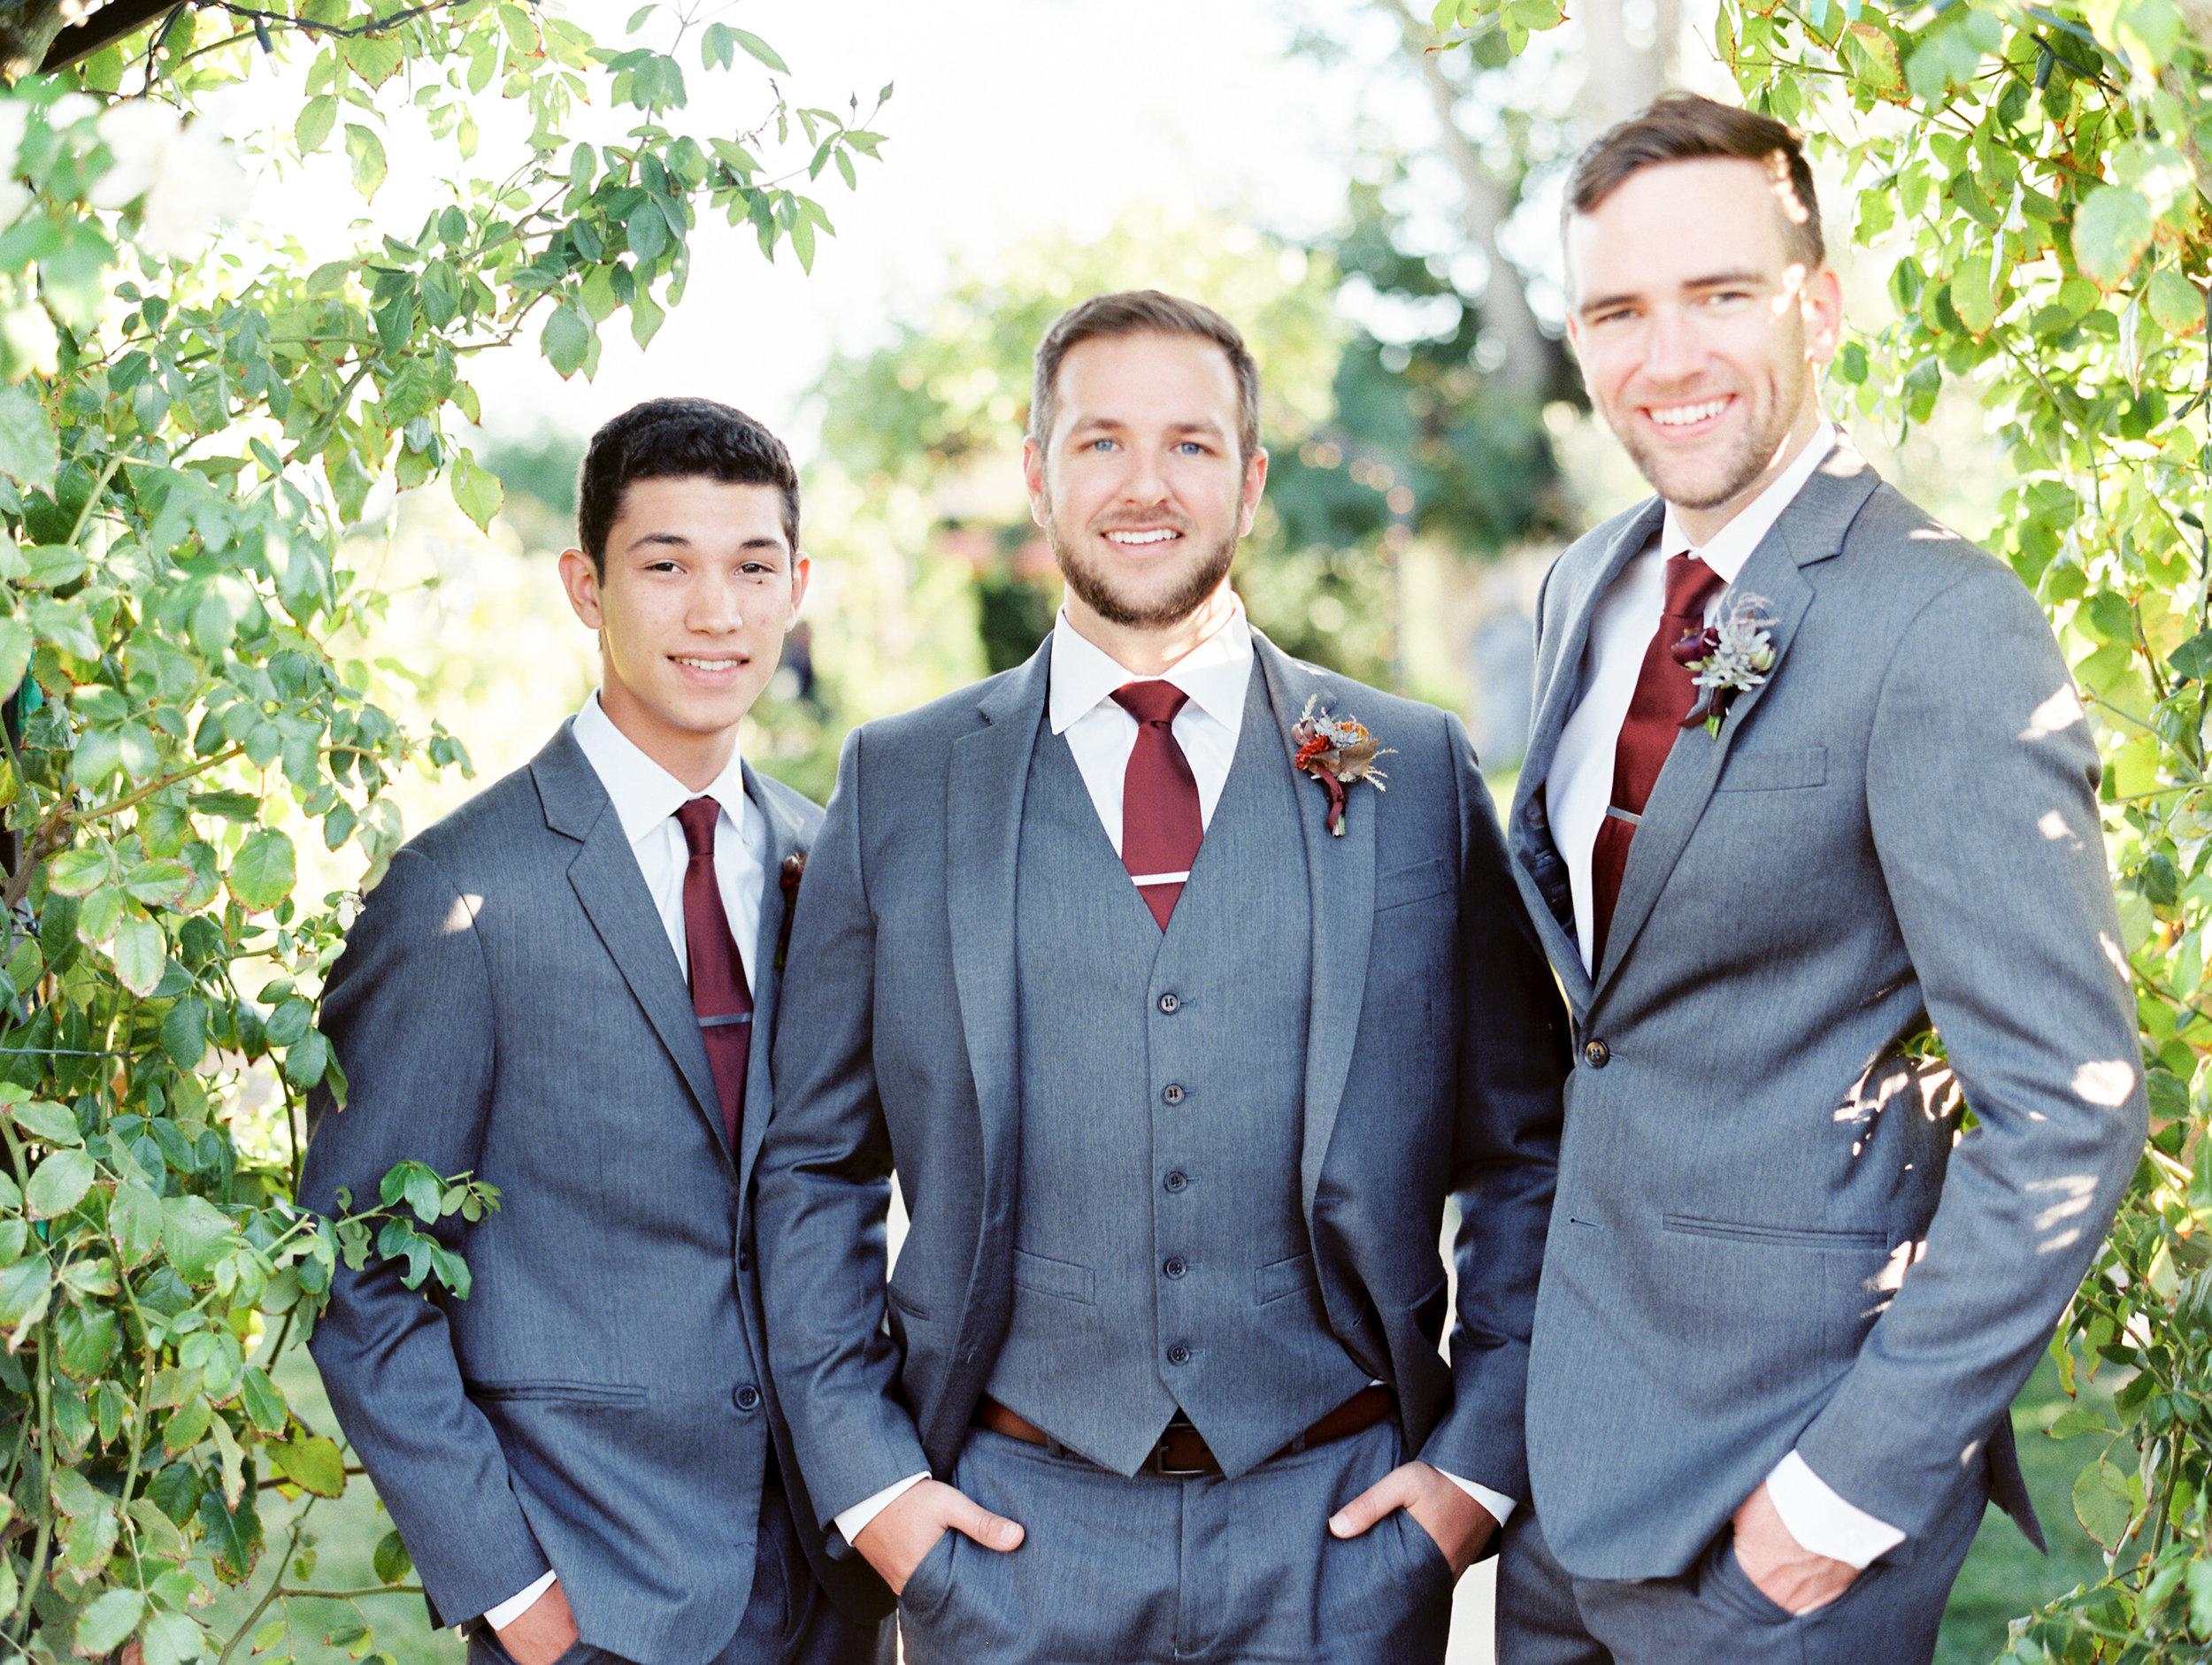 scribner-bend-vineyards-wedding-in-sacramento-california-2.jpg